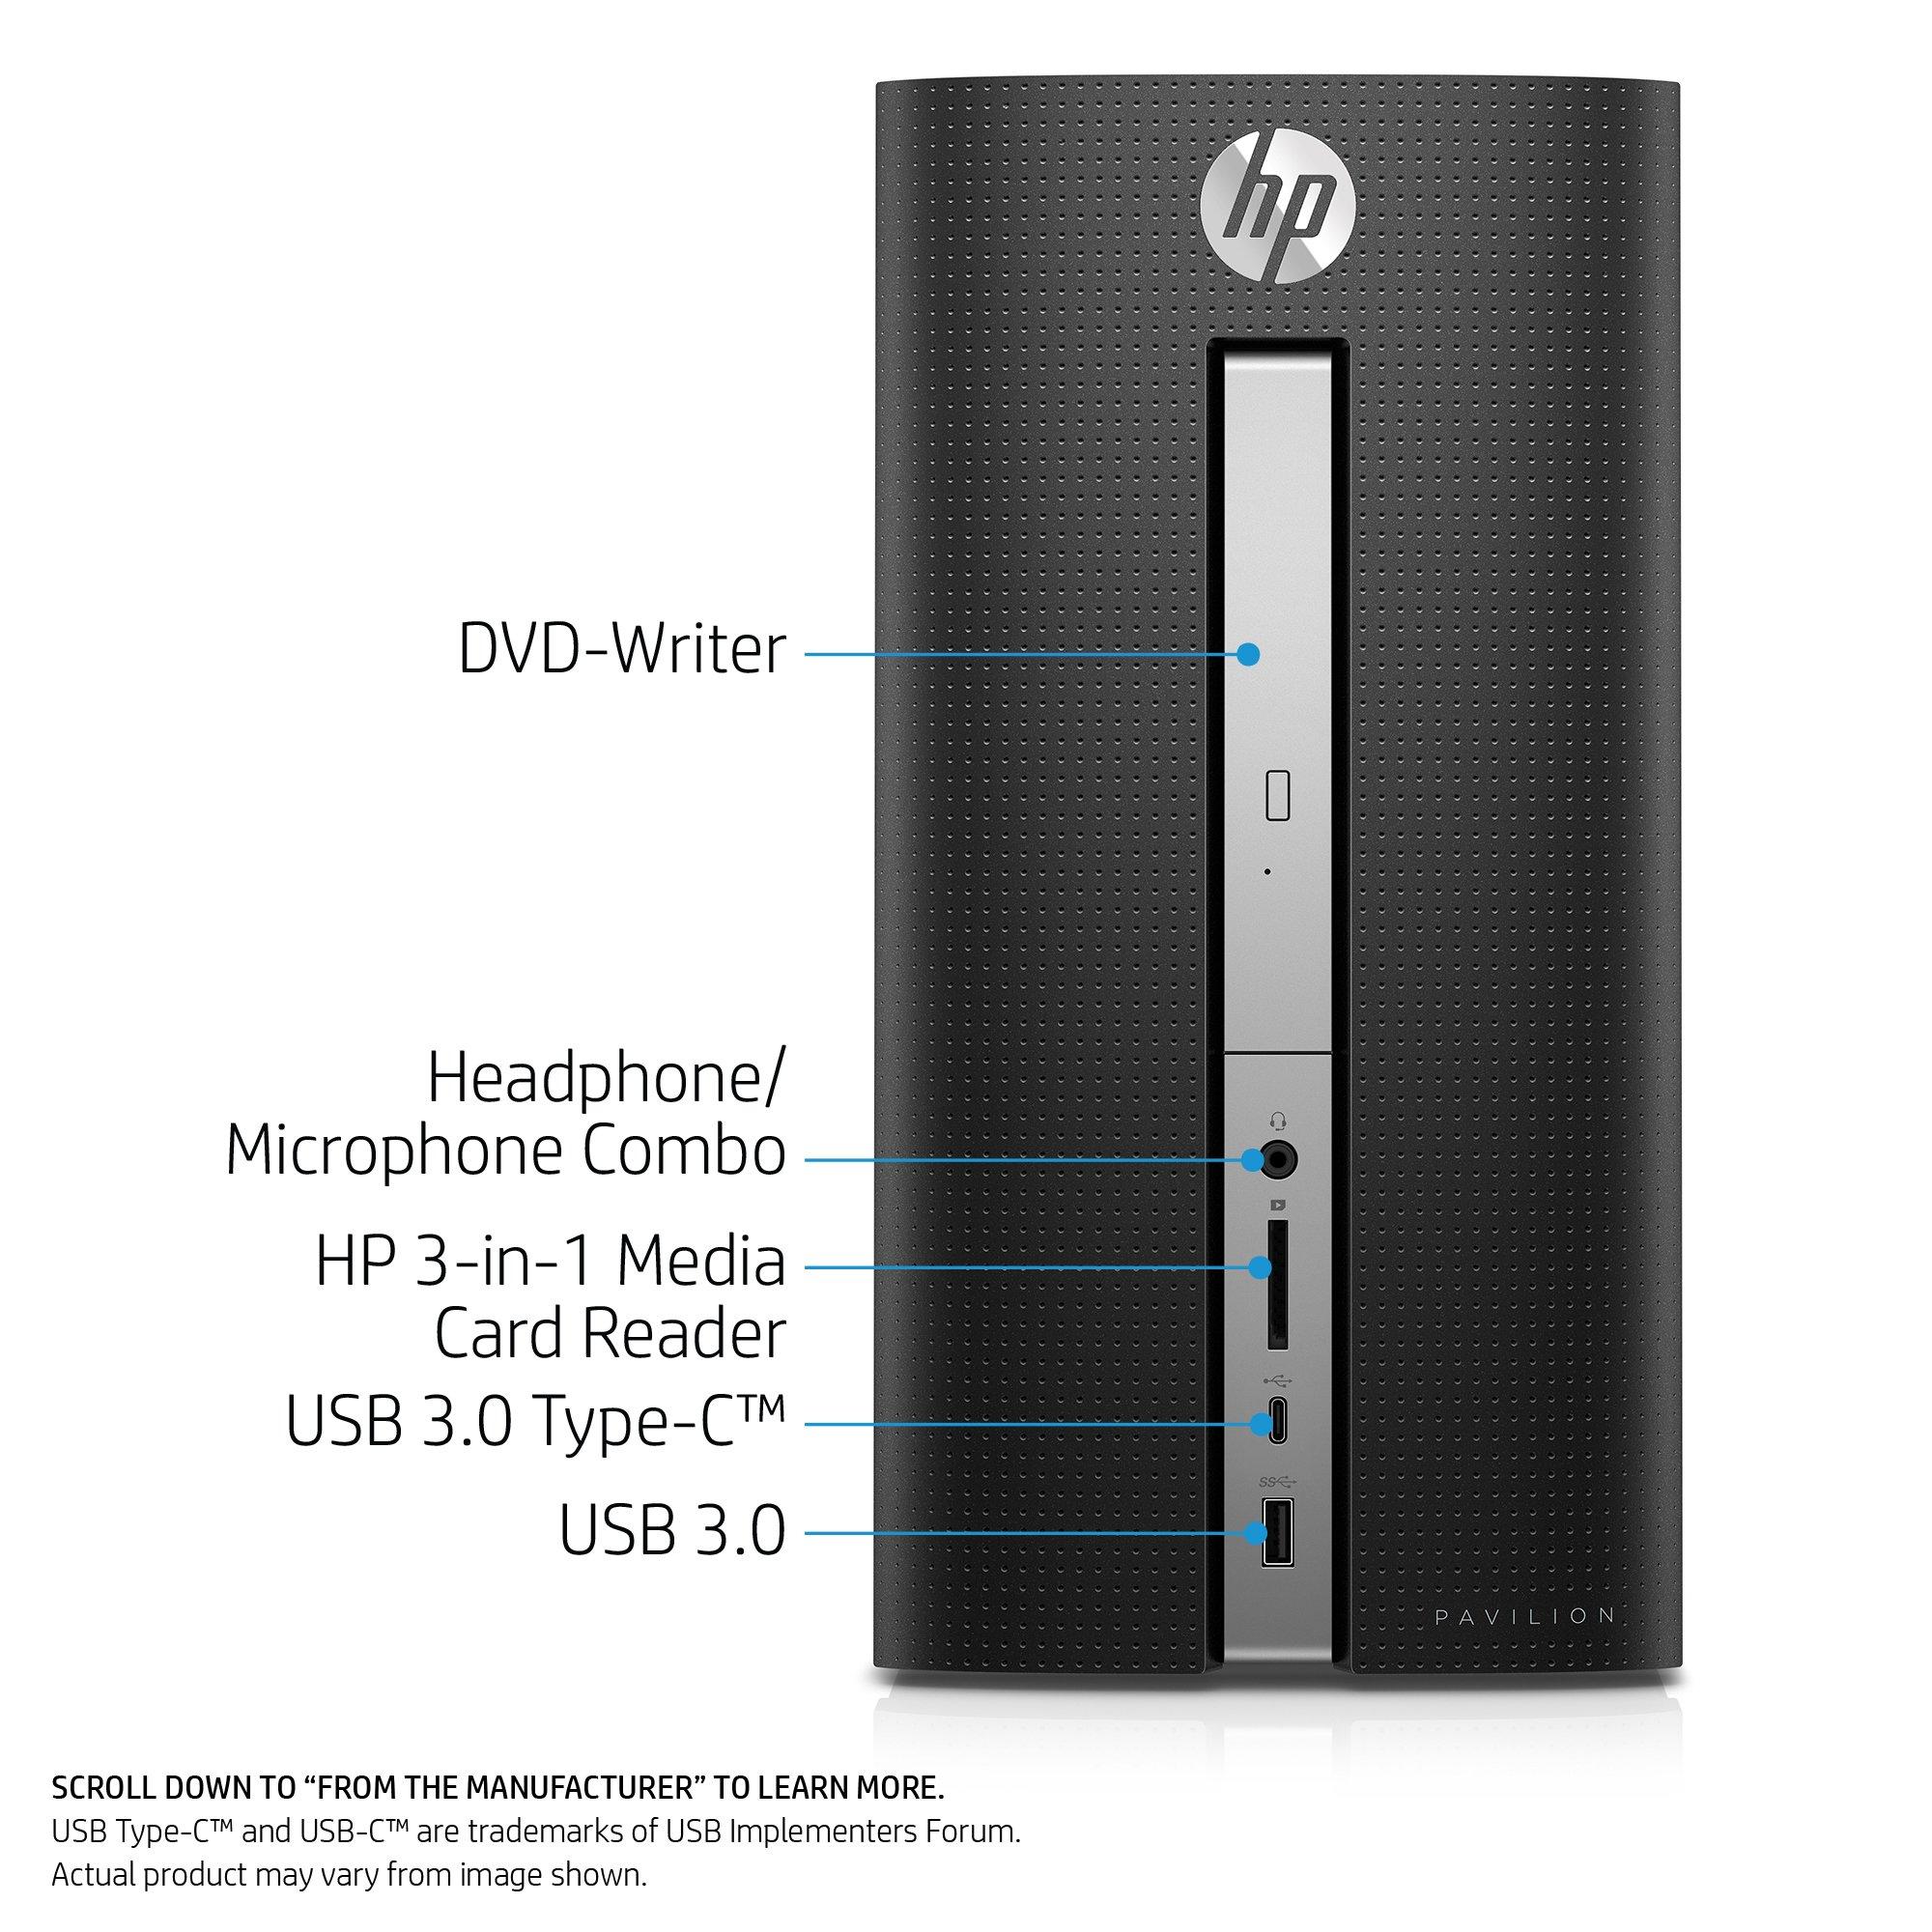 HP Pavilion Desktop Computer, Intel Core i7-7700, 12GB RAM, 1TB hard drive, Windows 10 (570-p030, Black) by HP (Image #1)